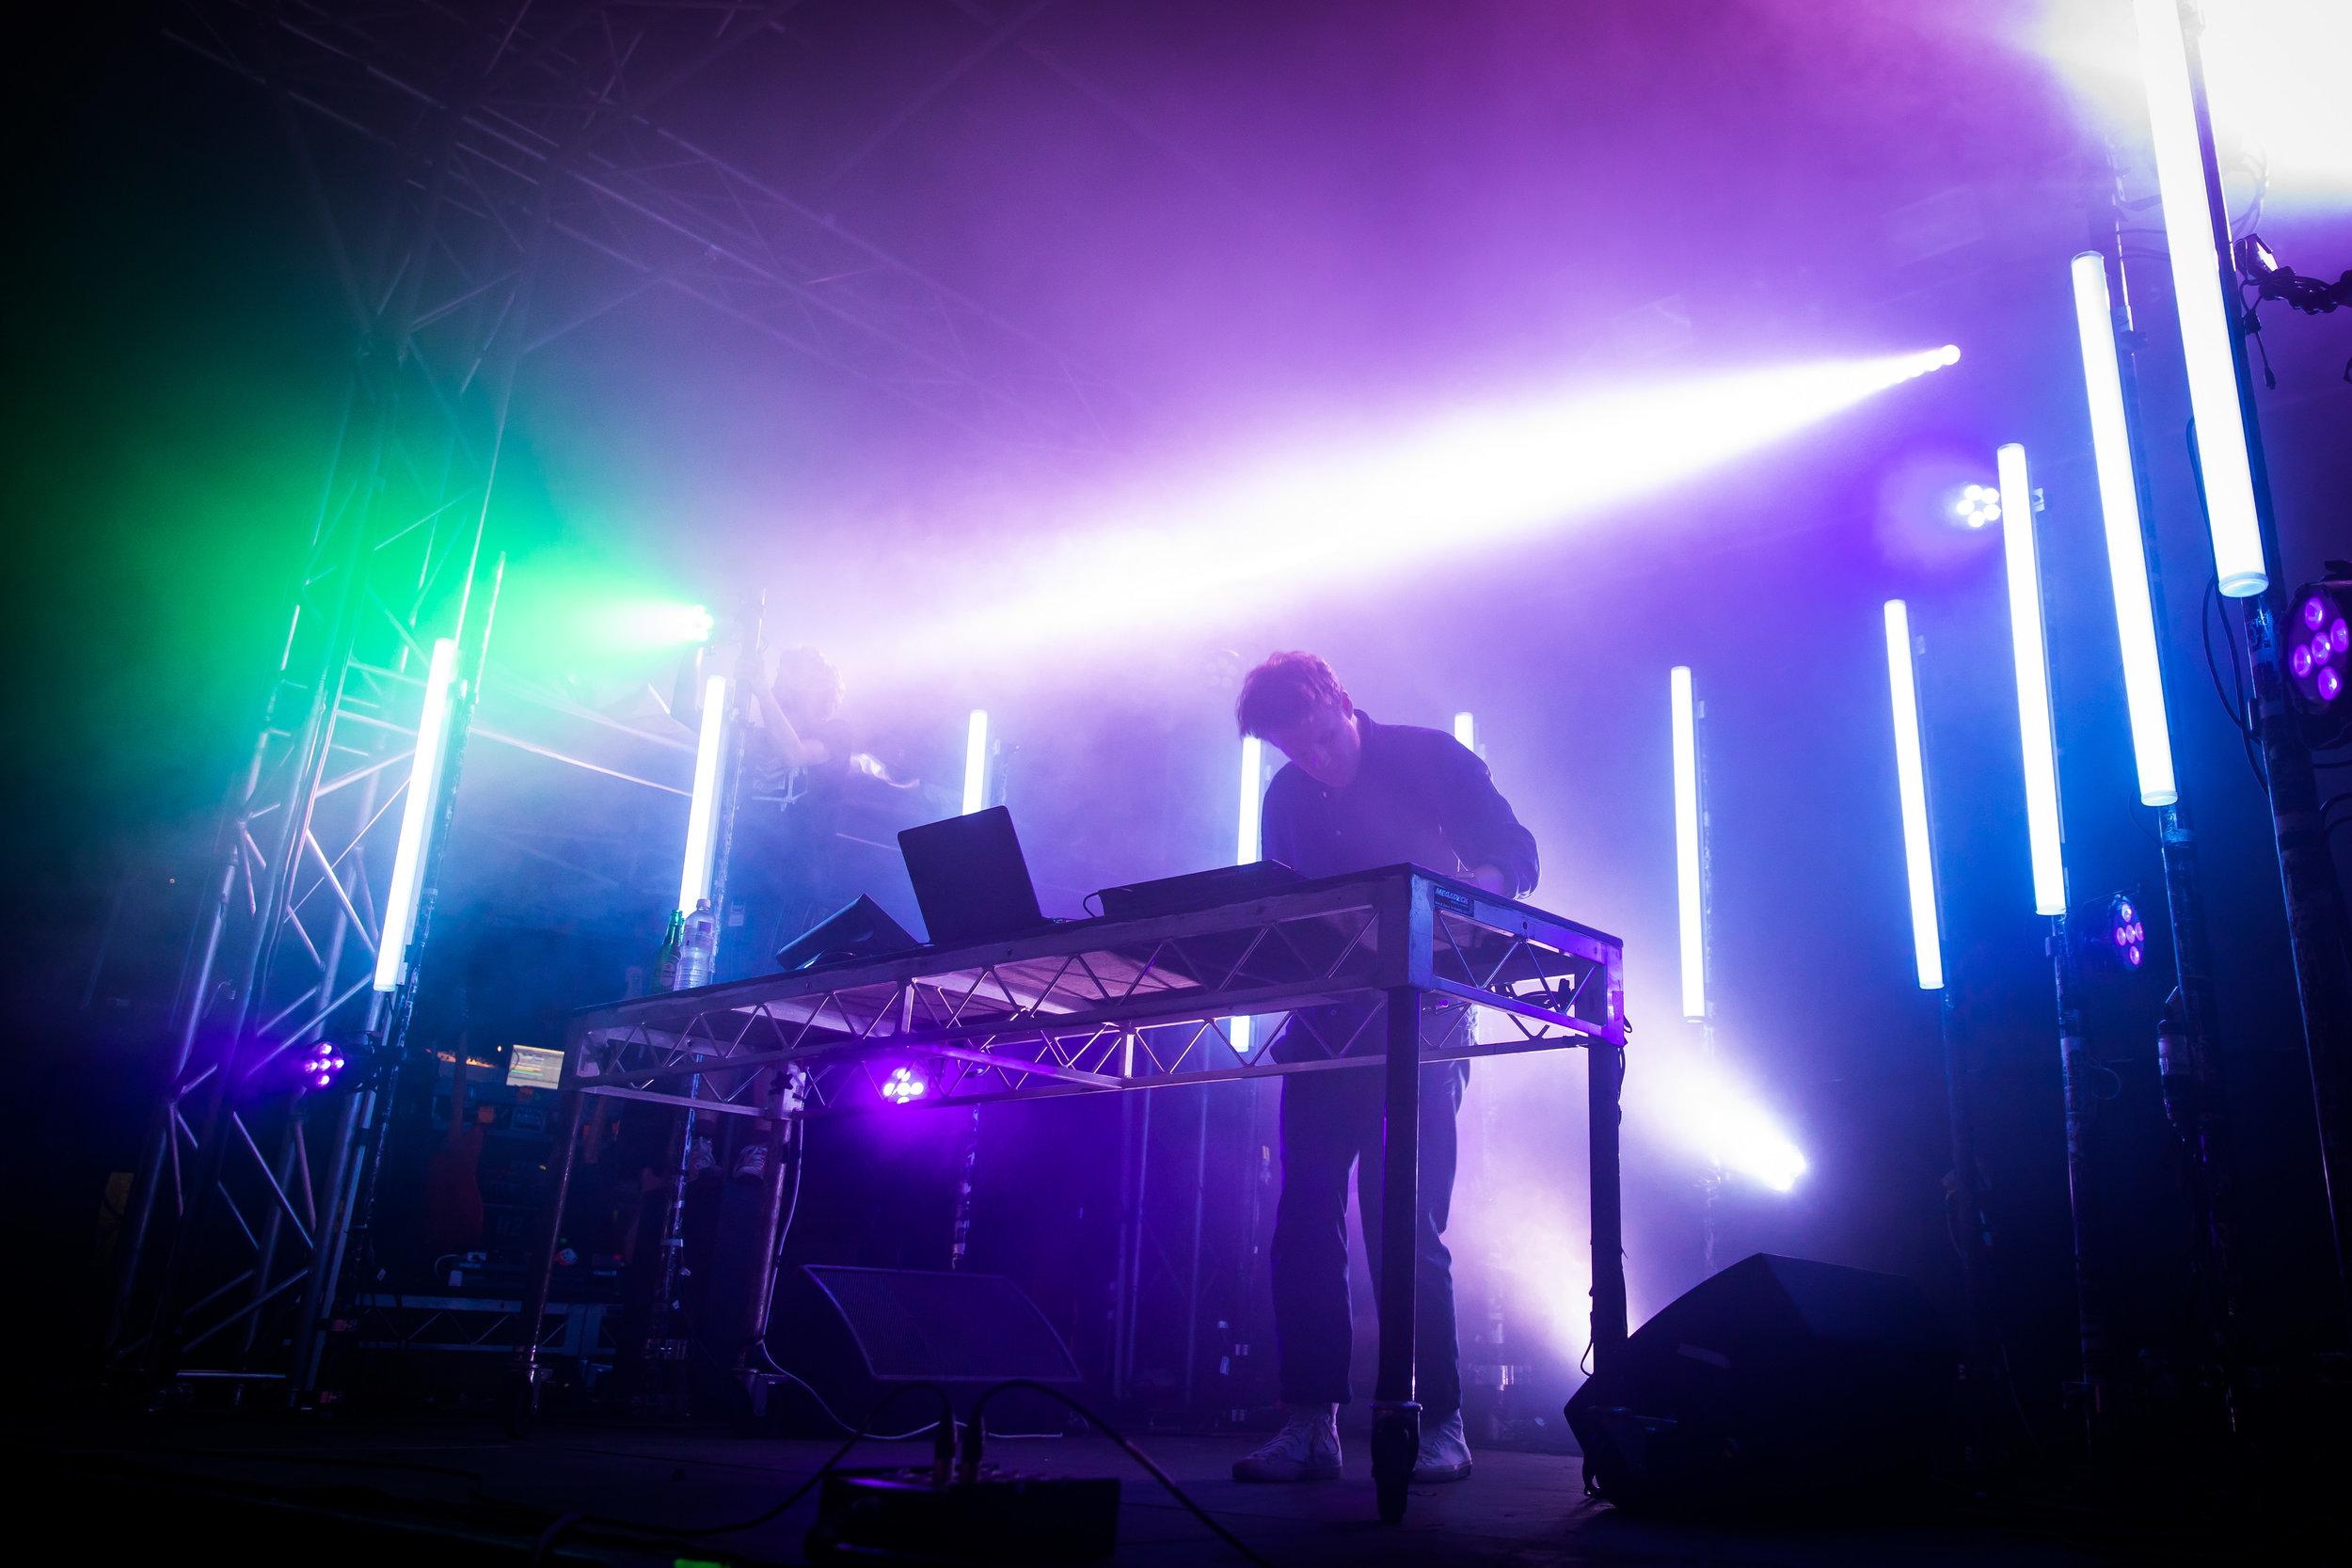 030_portfolio_arts_TOURIST_Laneway-Festival-Sydney-2017_credit-Anna_Kucera_109.jpg